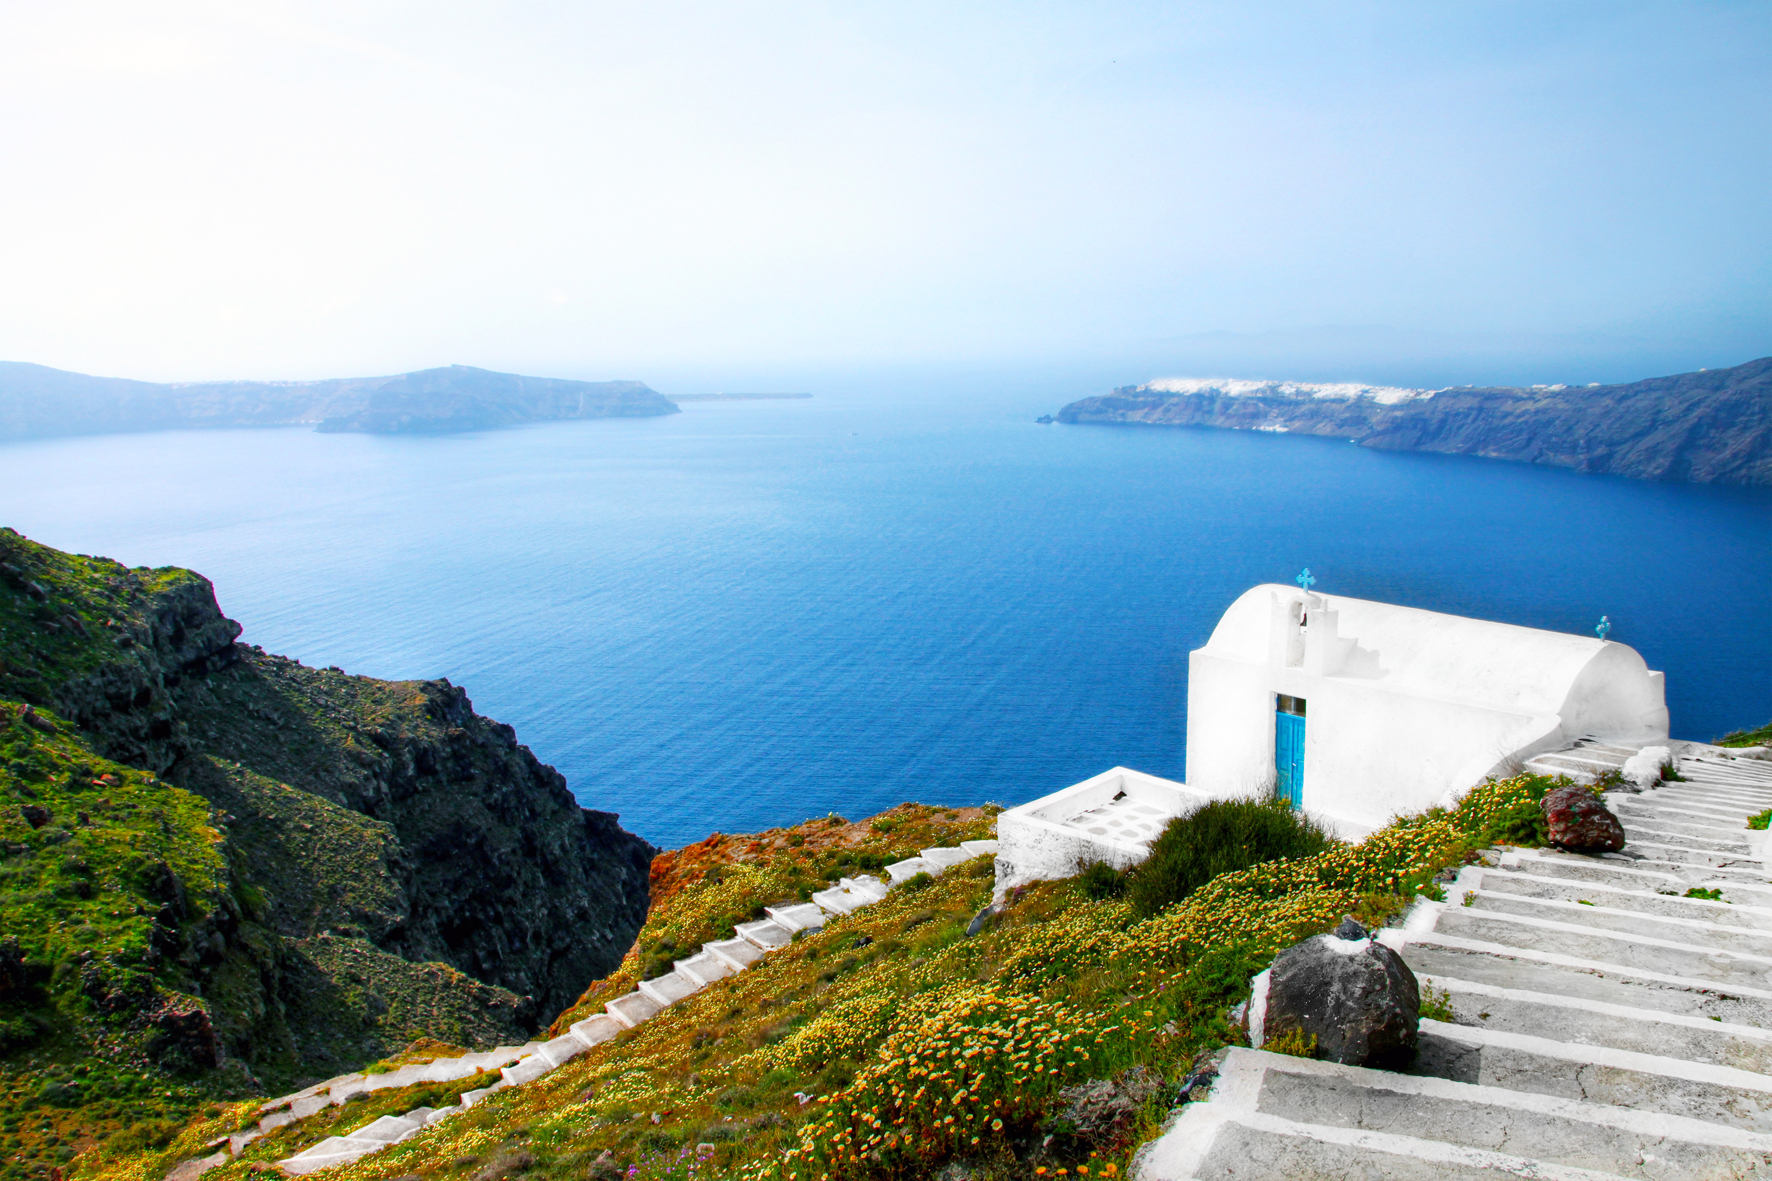 Mitico Mediterraneo Grecia Low Cost Latitudes